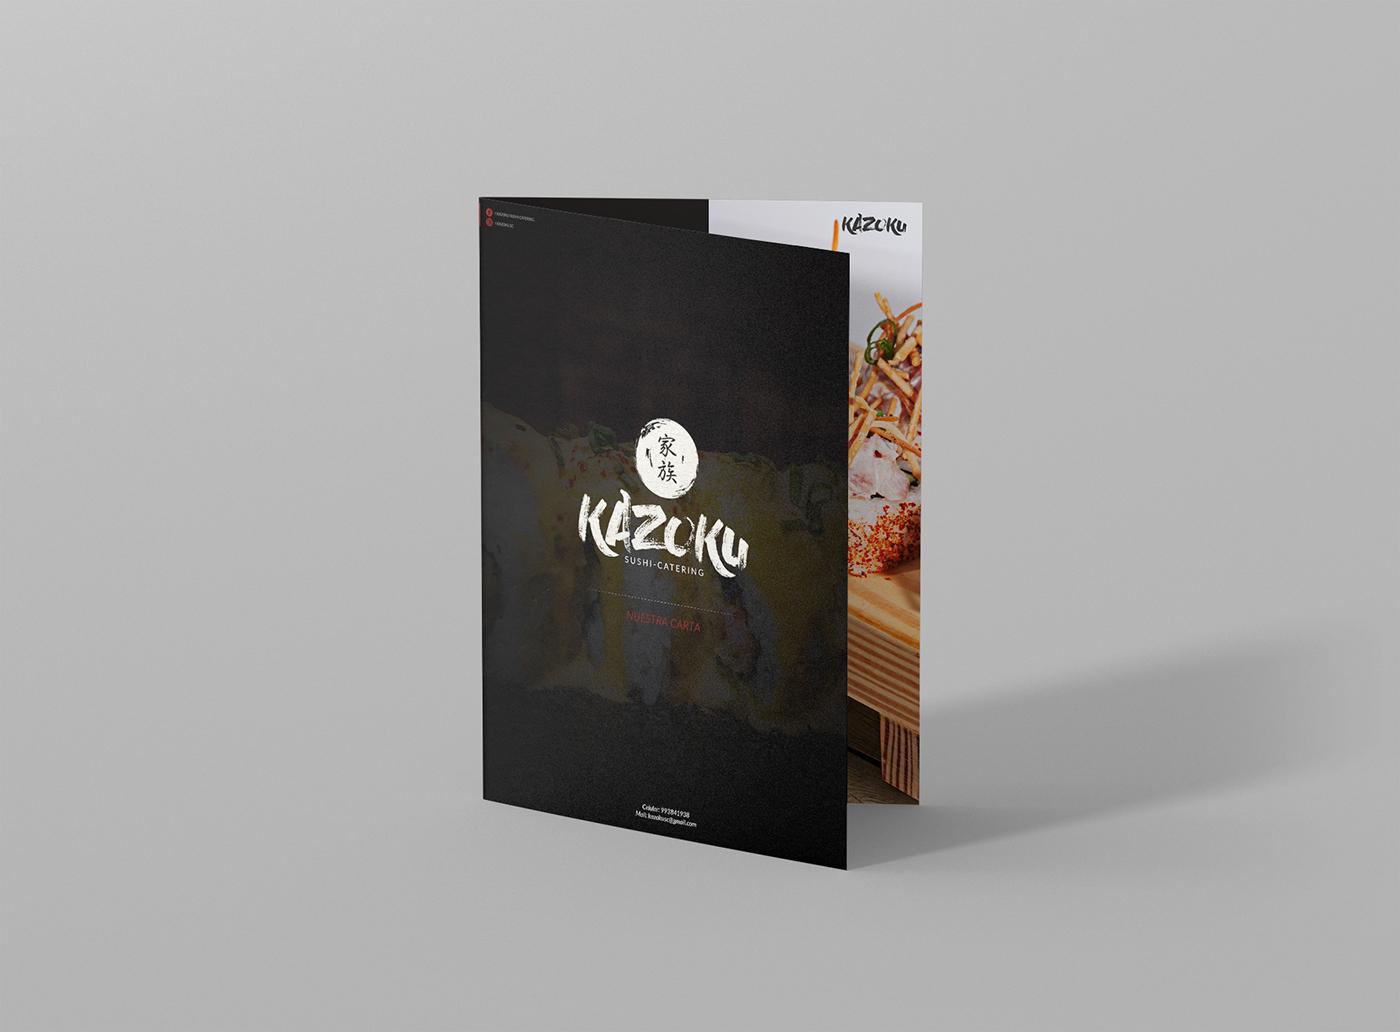 Kazoku sushi catering on Behance